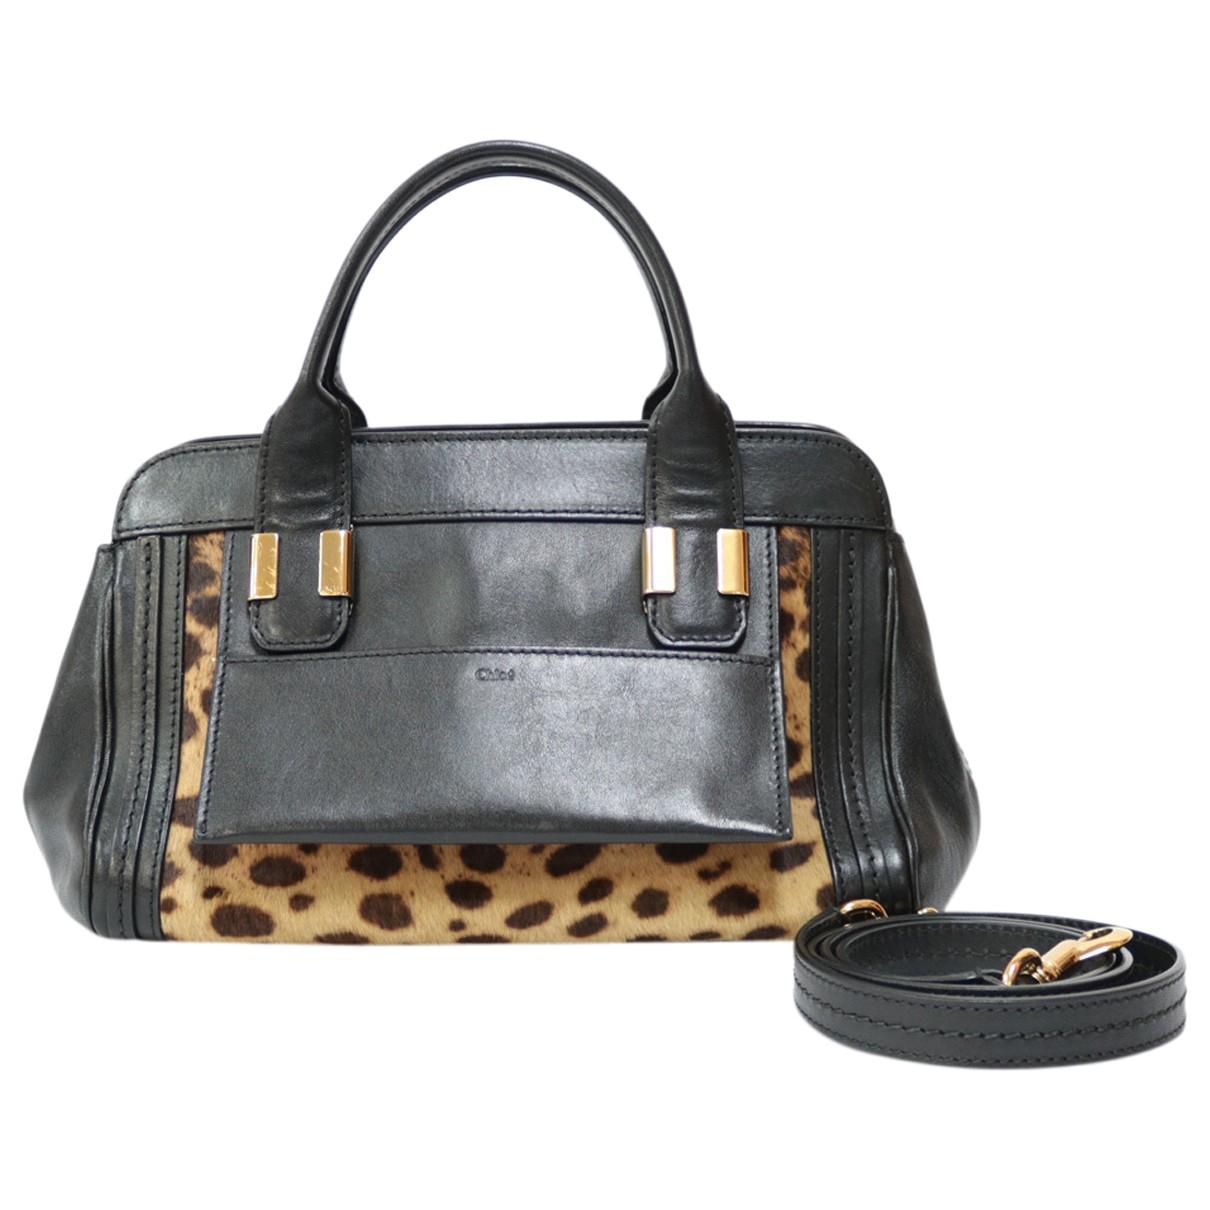 Chloé \N Black Leather handbag for Women \N